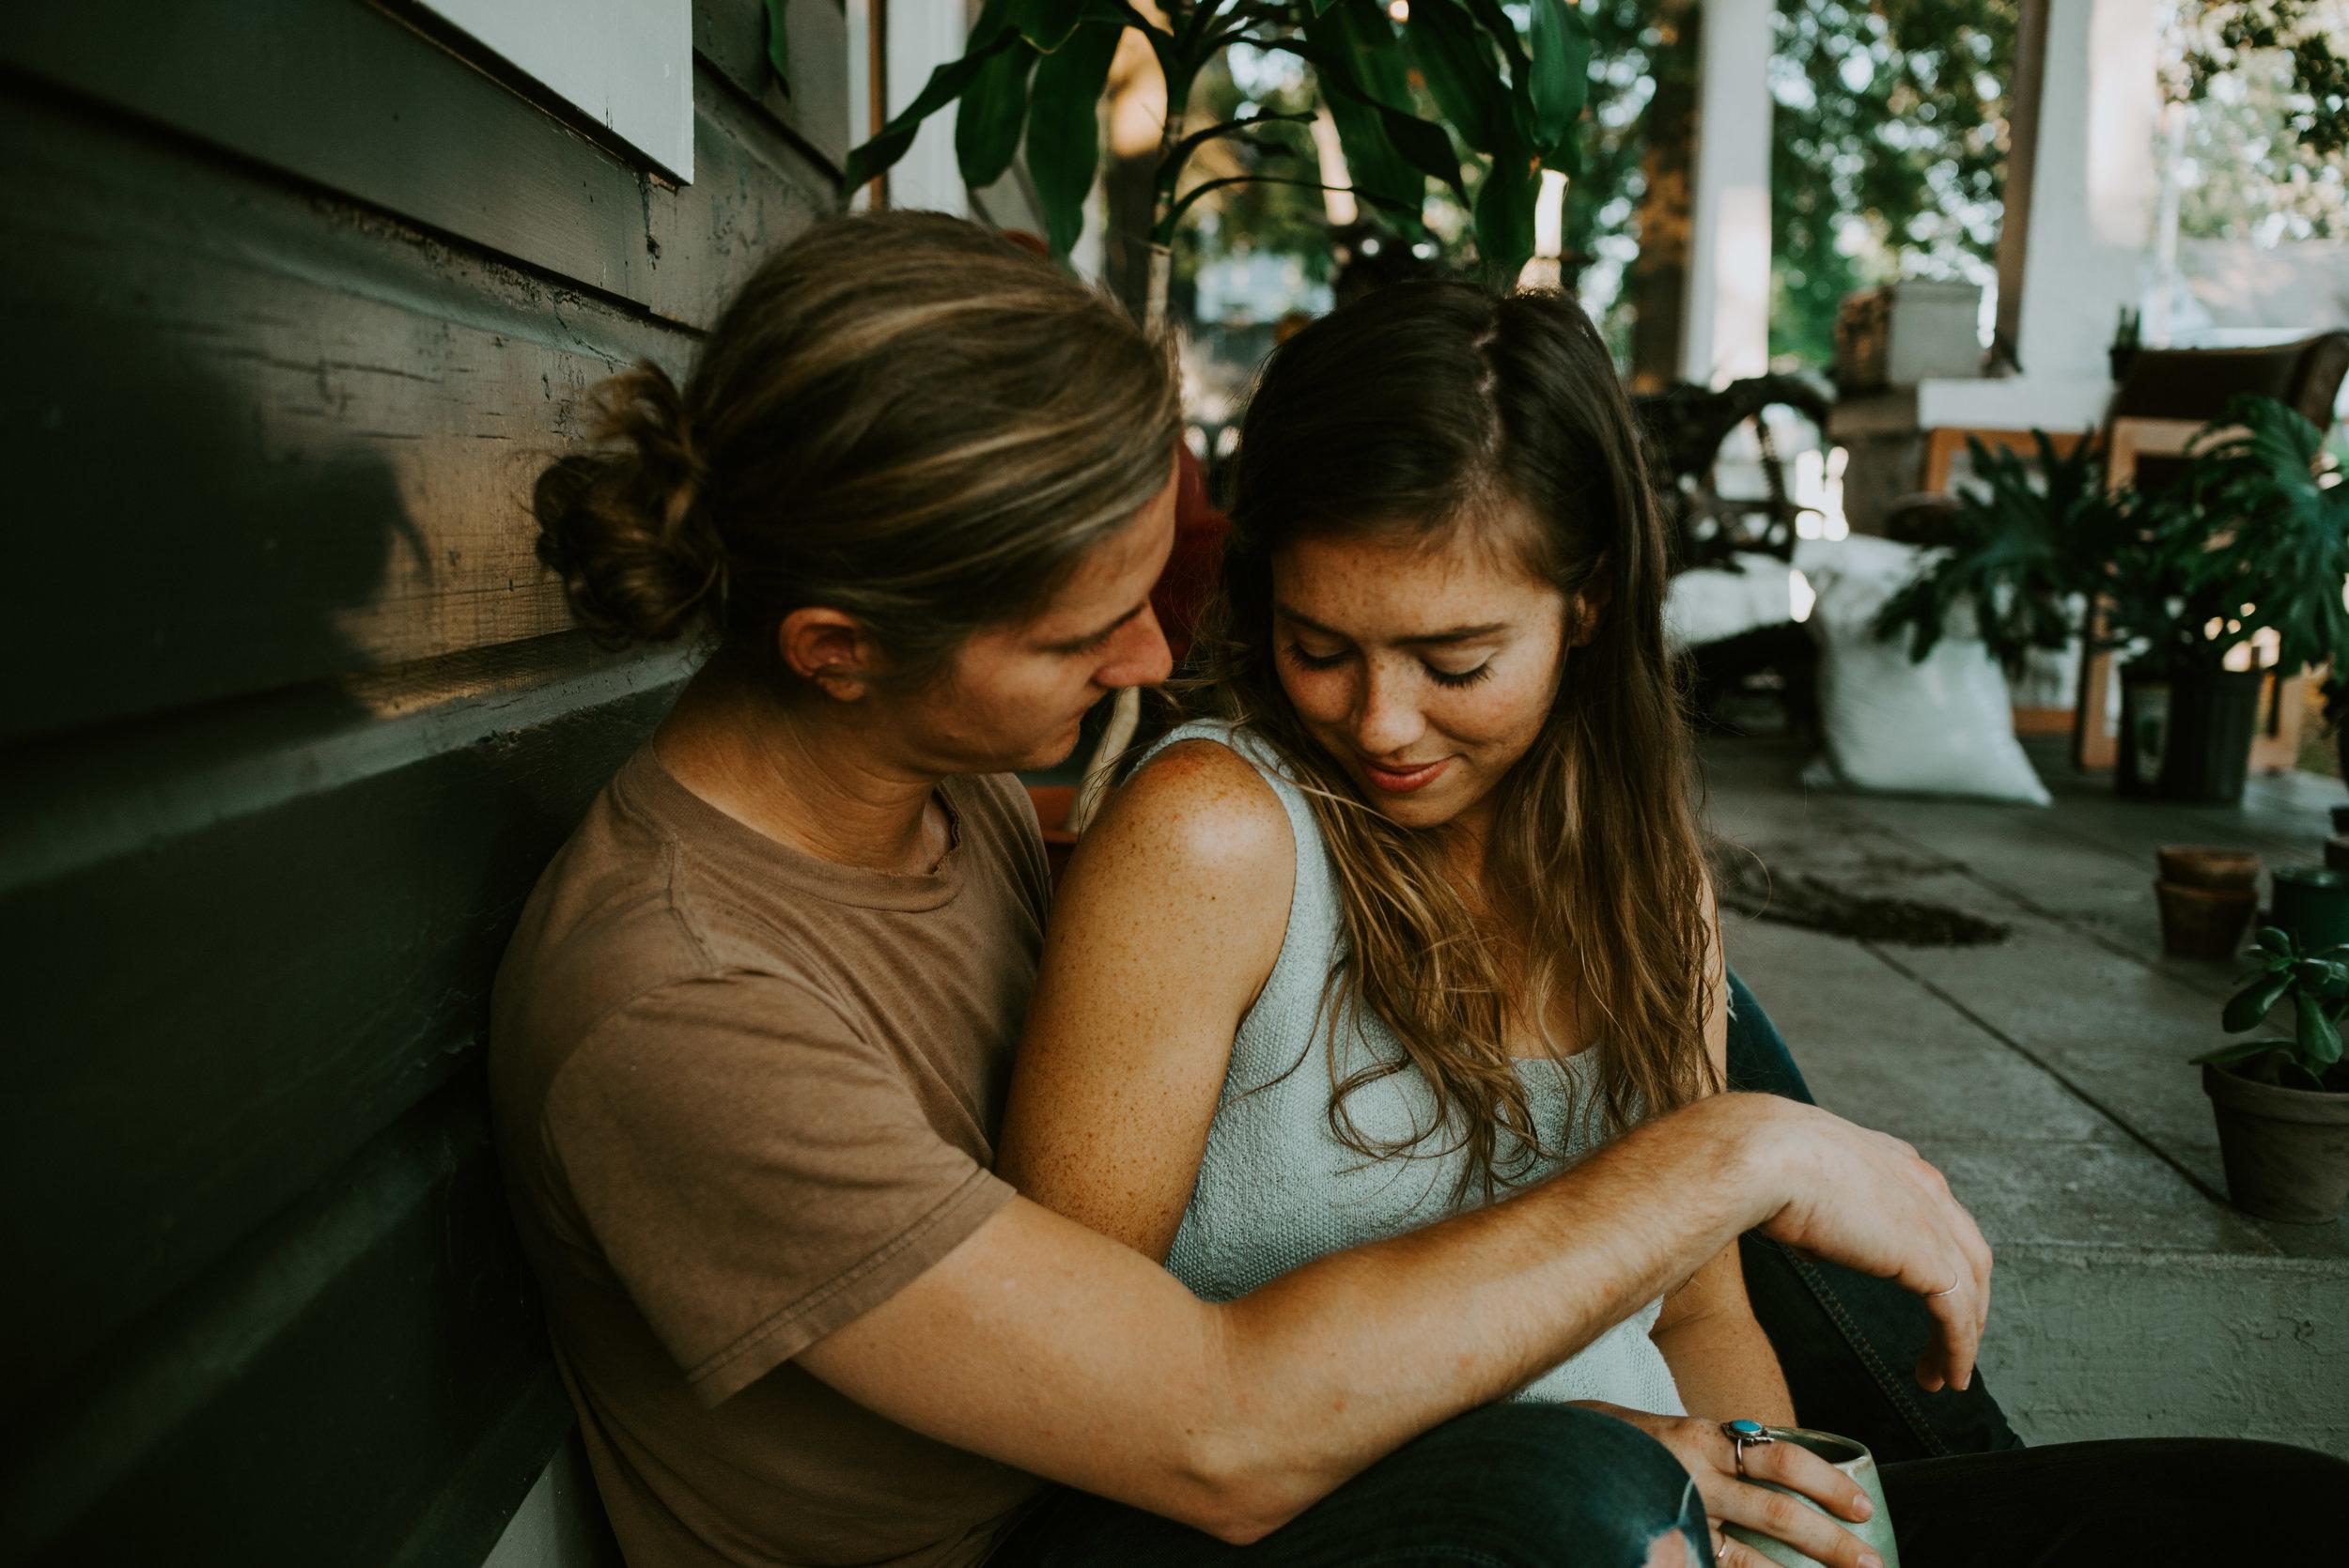 WonderlyCreative_Couples_7.9.18_Cameron&Alexis_-103.jpg